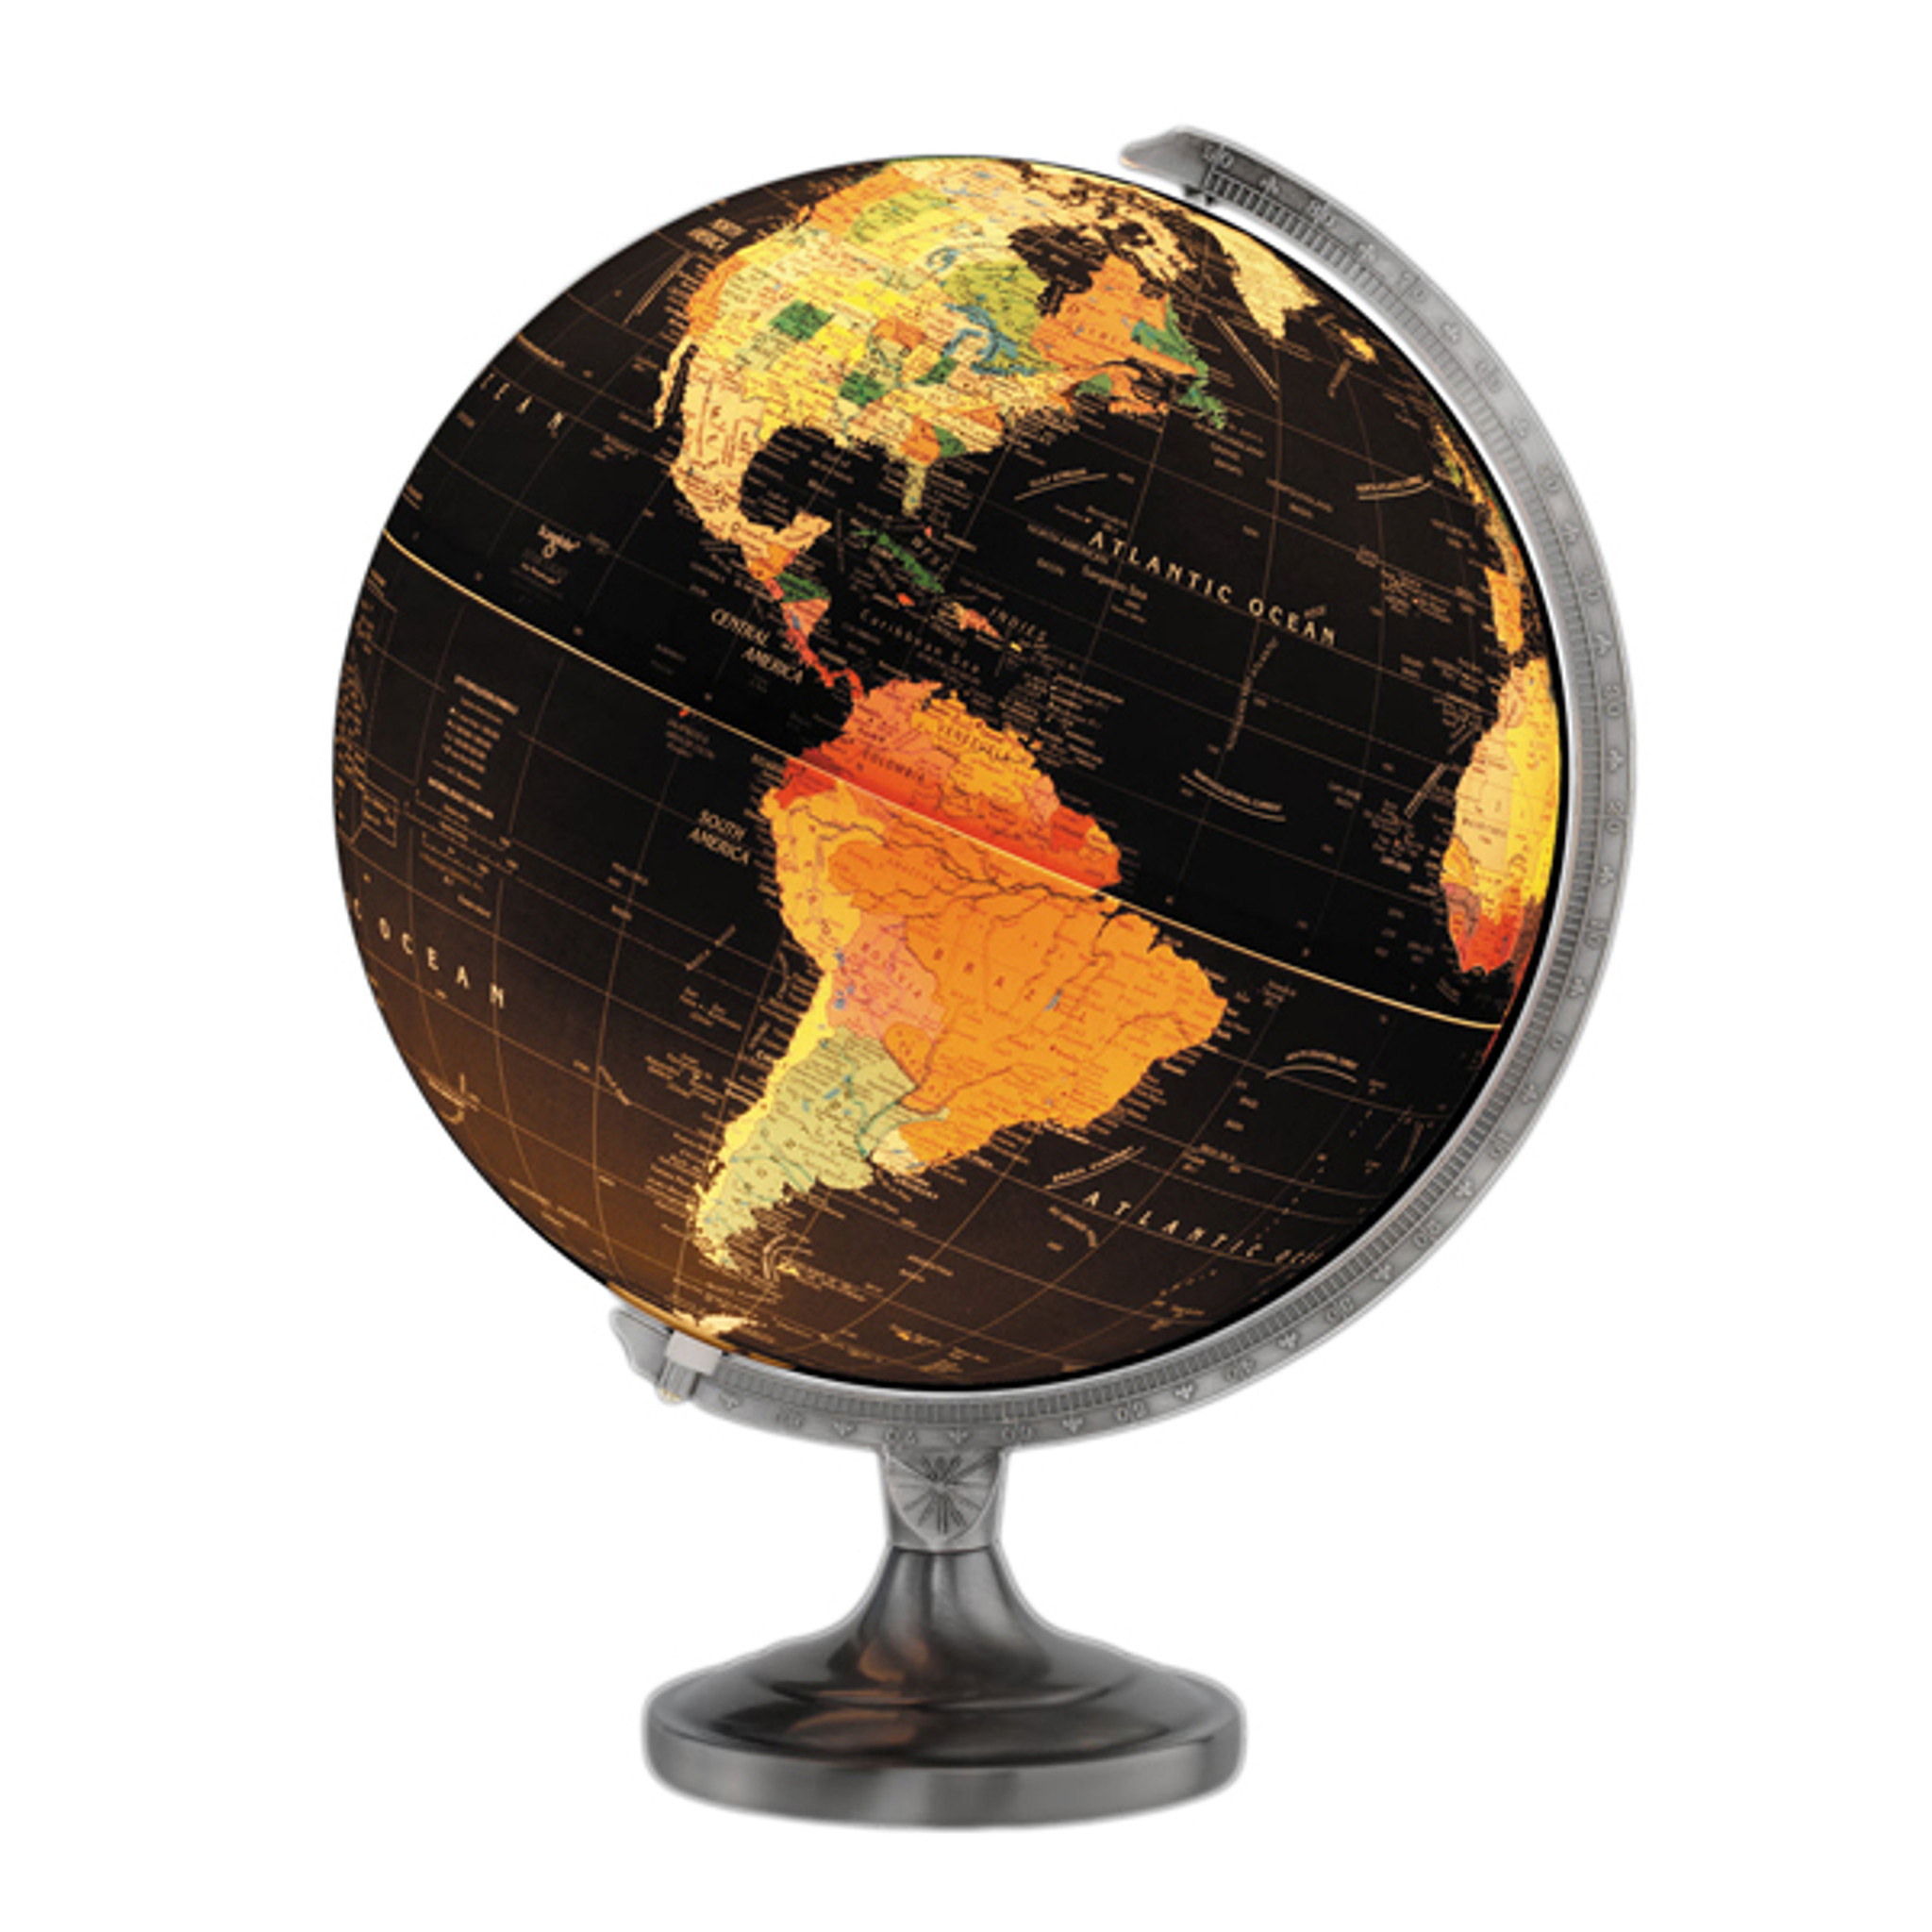 Orion Illuminated 12 Desk Globe